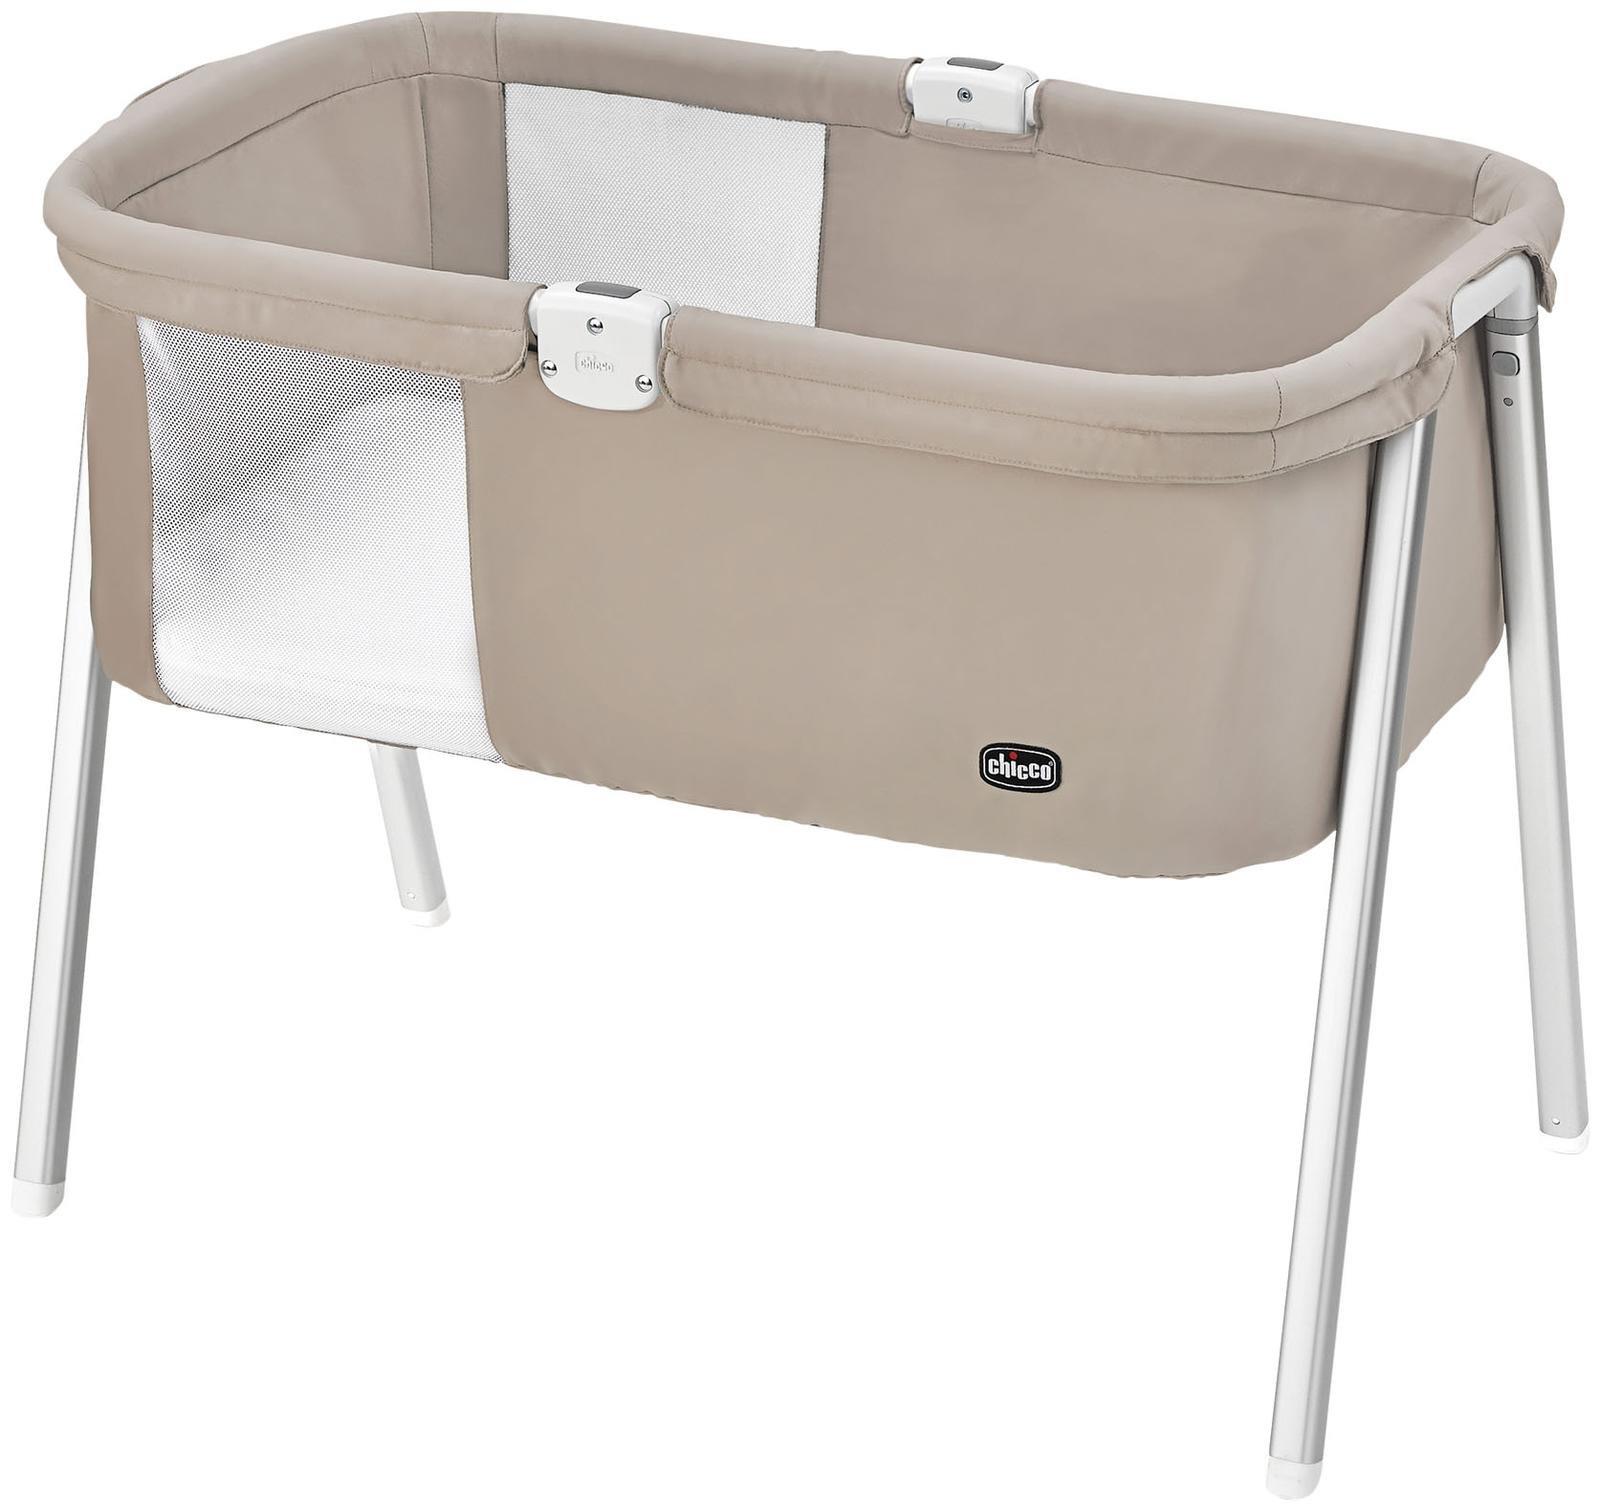 berceau pour bebe chicco lullago avis tests et prix en. Black Bedroom Furniture Sets. Home Design Ideas